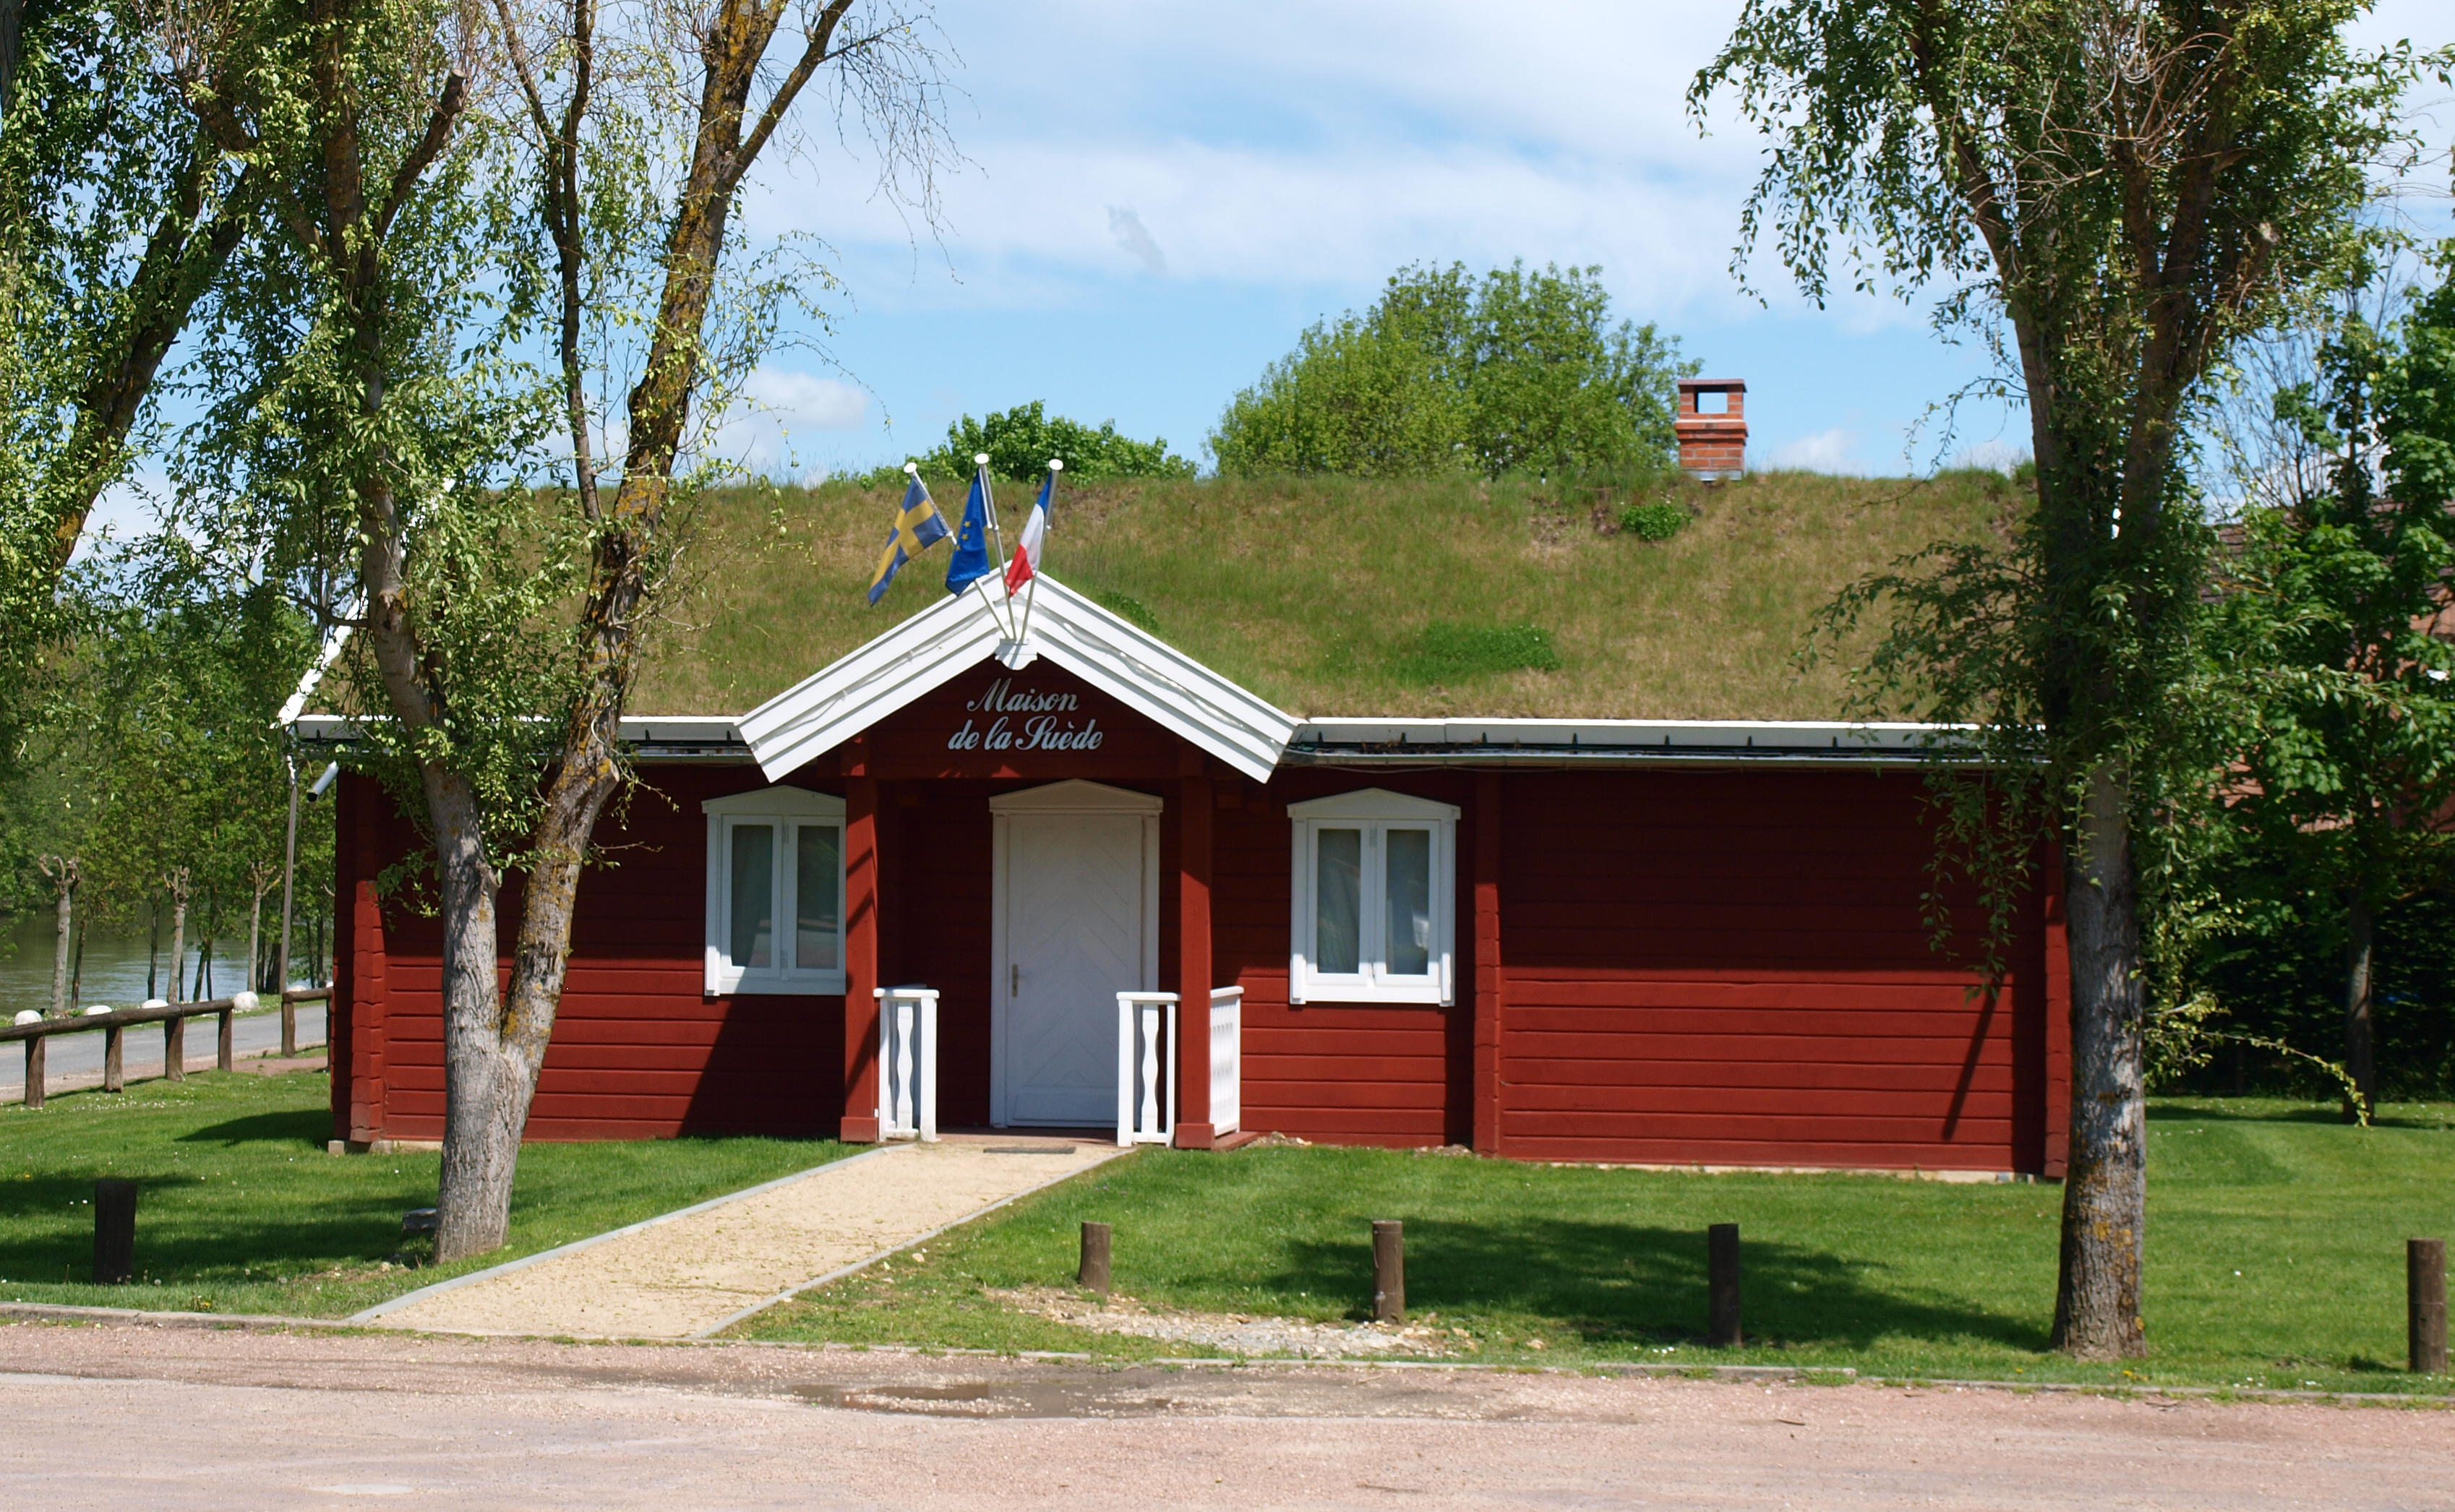 La Maison De La Suede file:cepoy-45-e04 - wikimedia commons